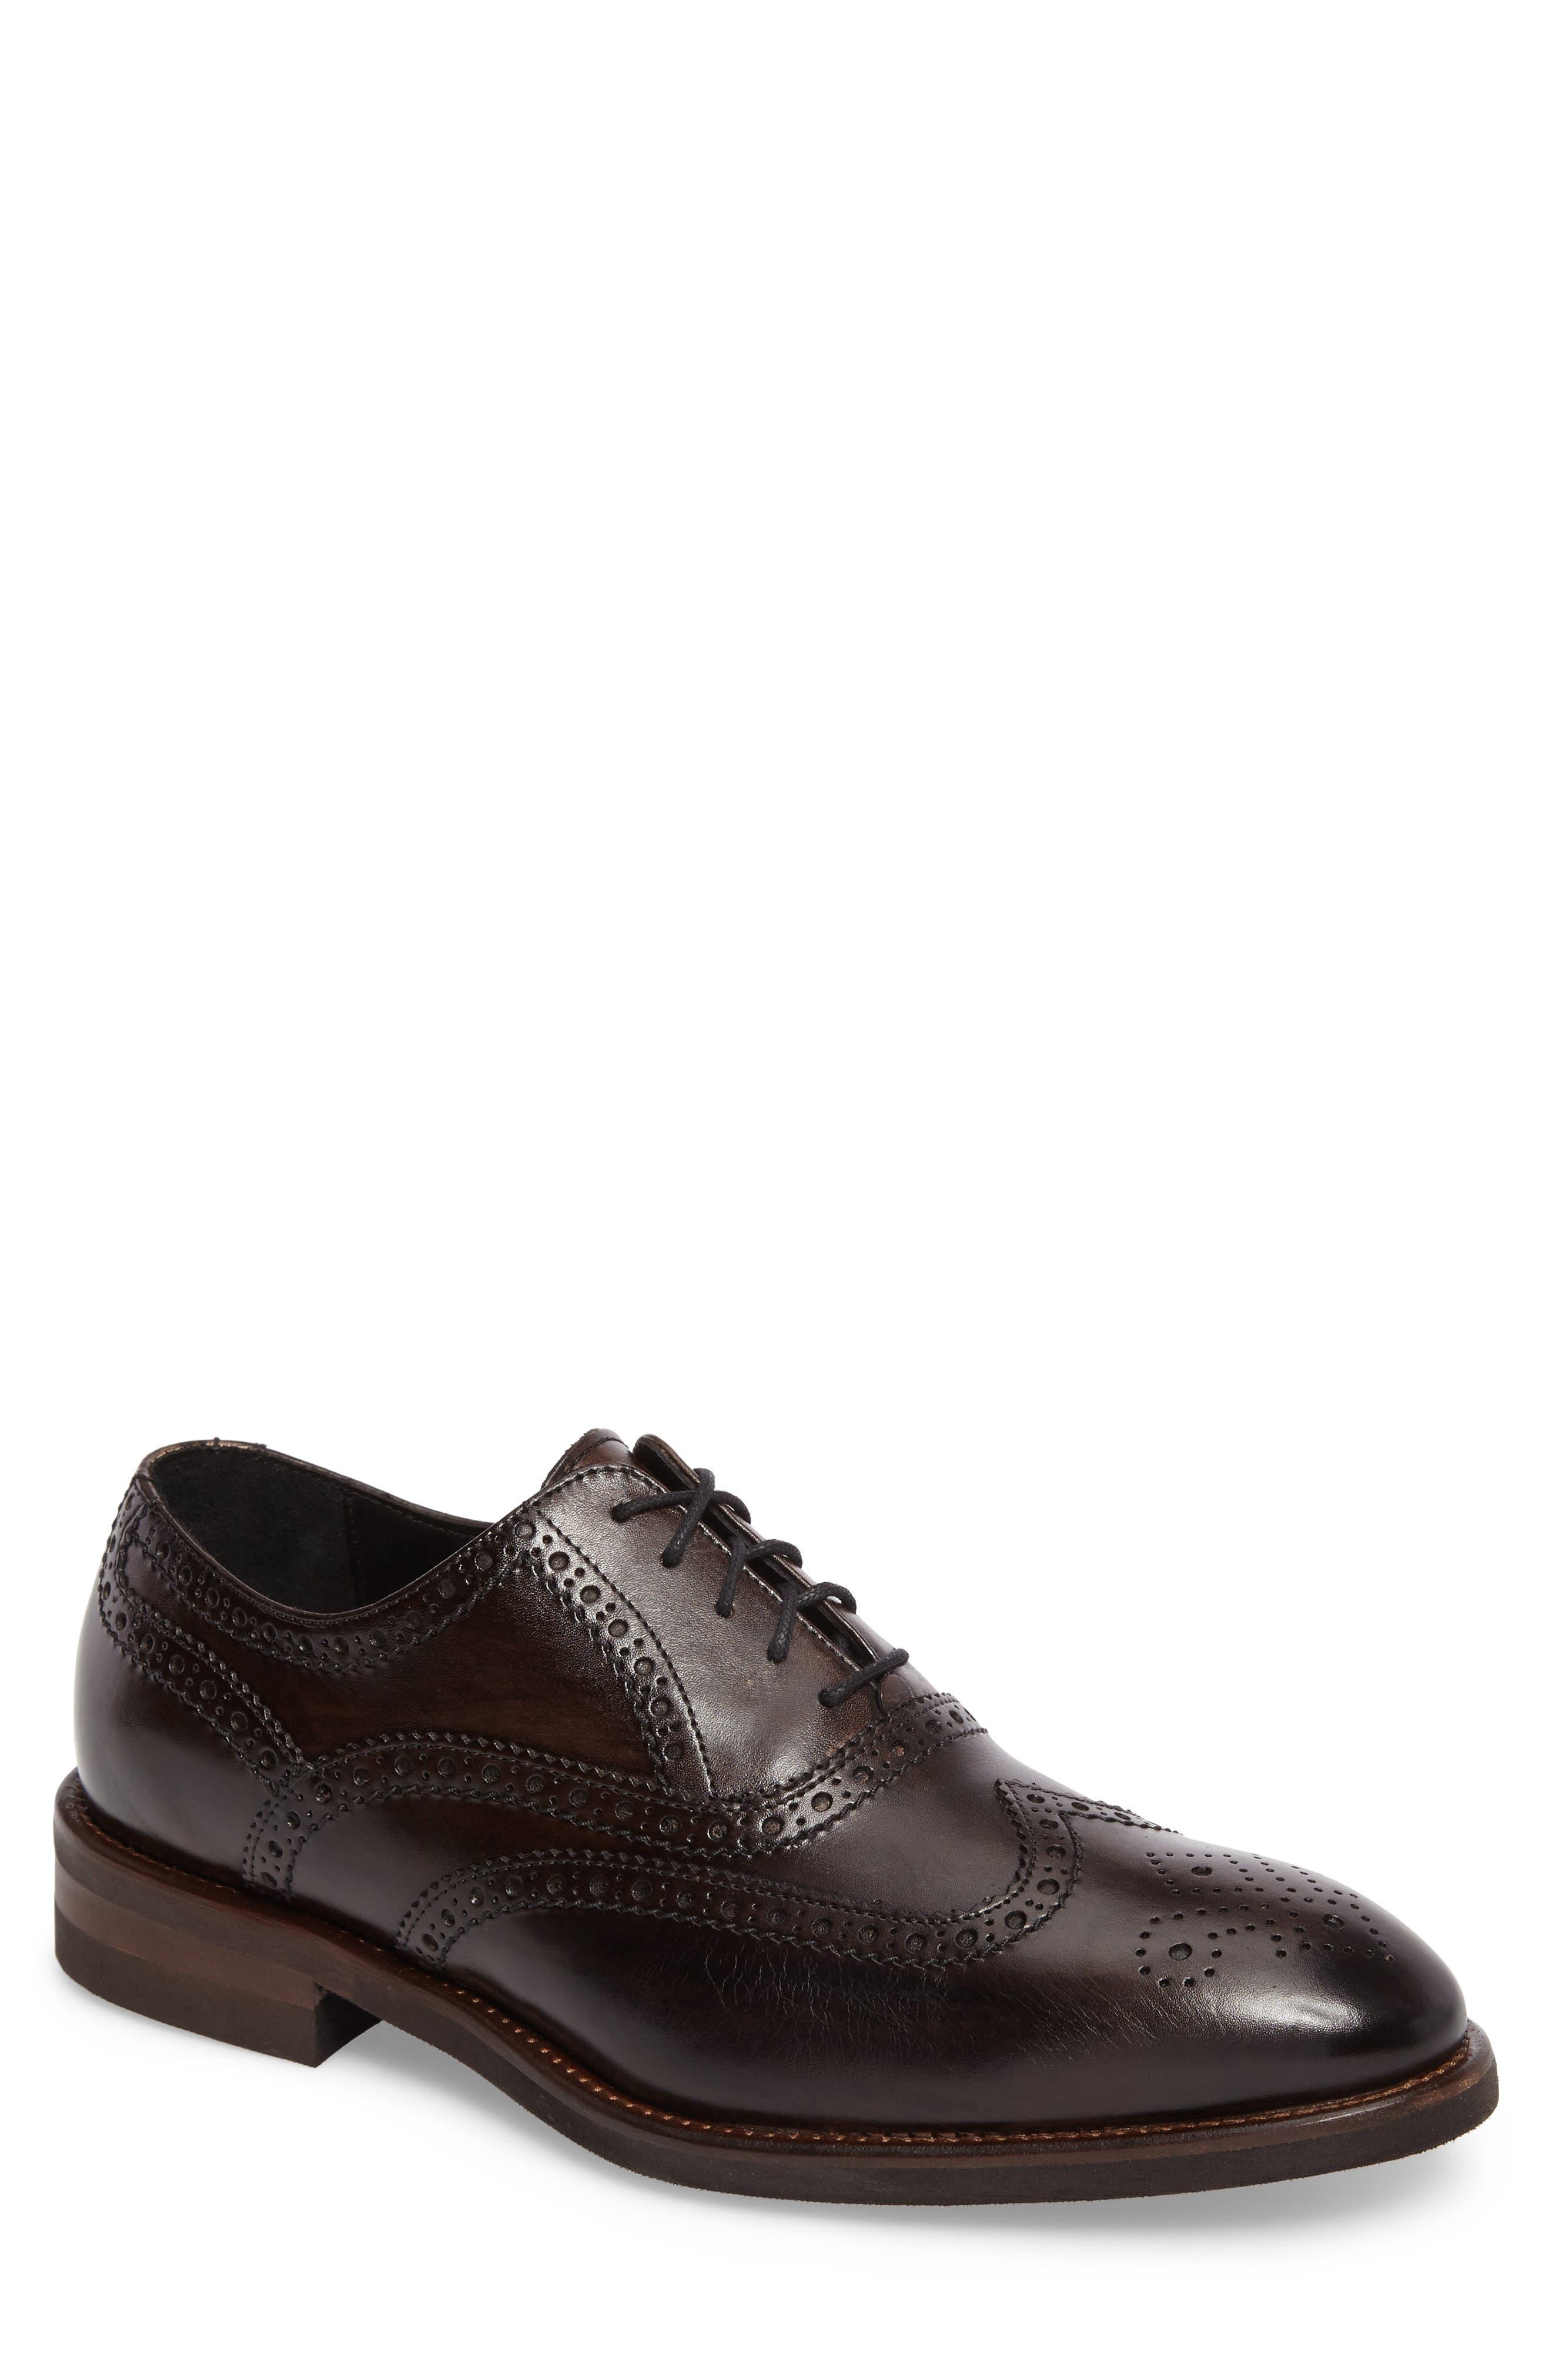 Tivoli Wingtip,                         Main,                         color, Brown Leather